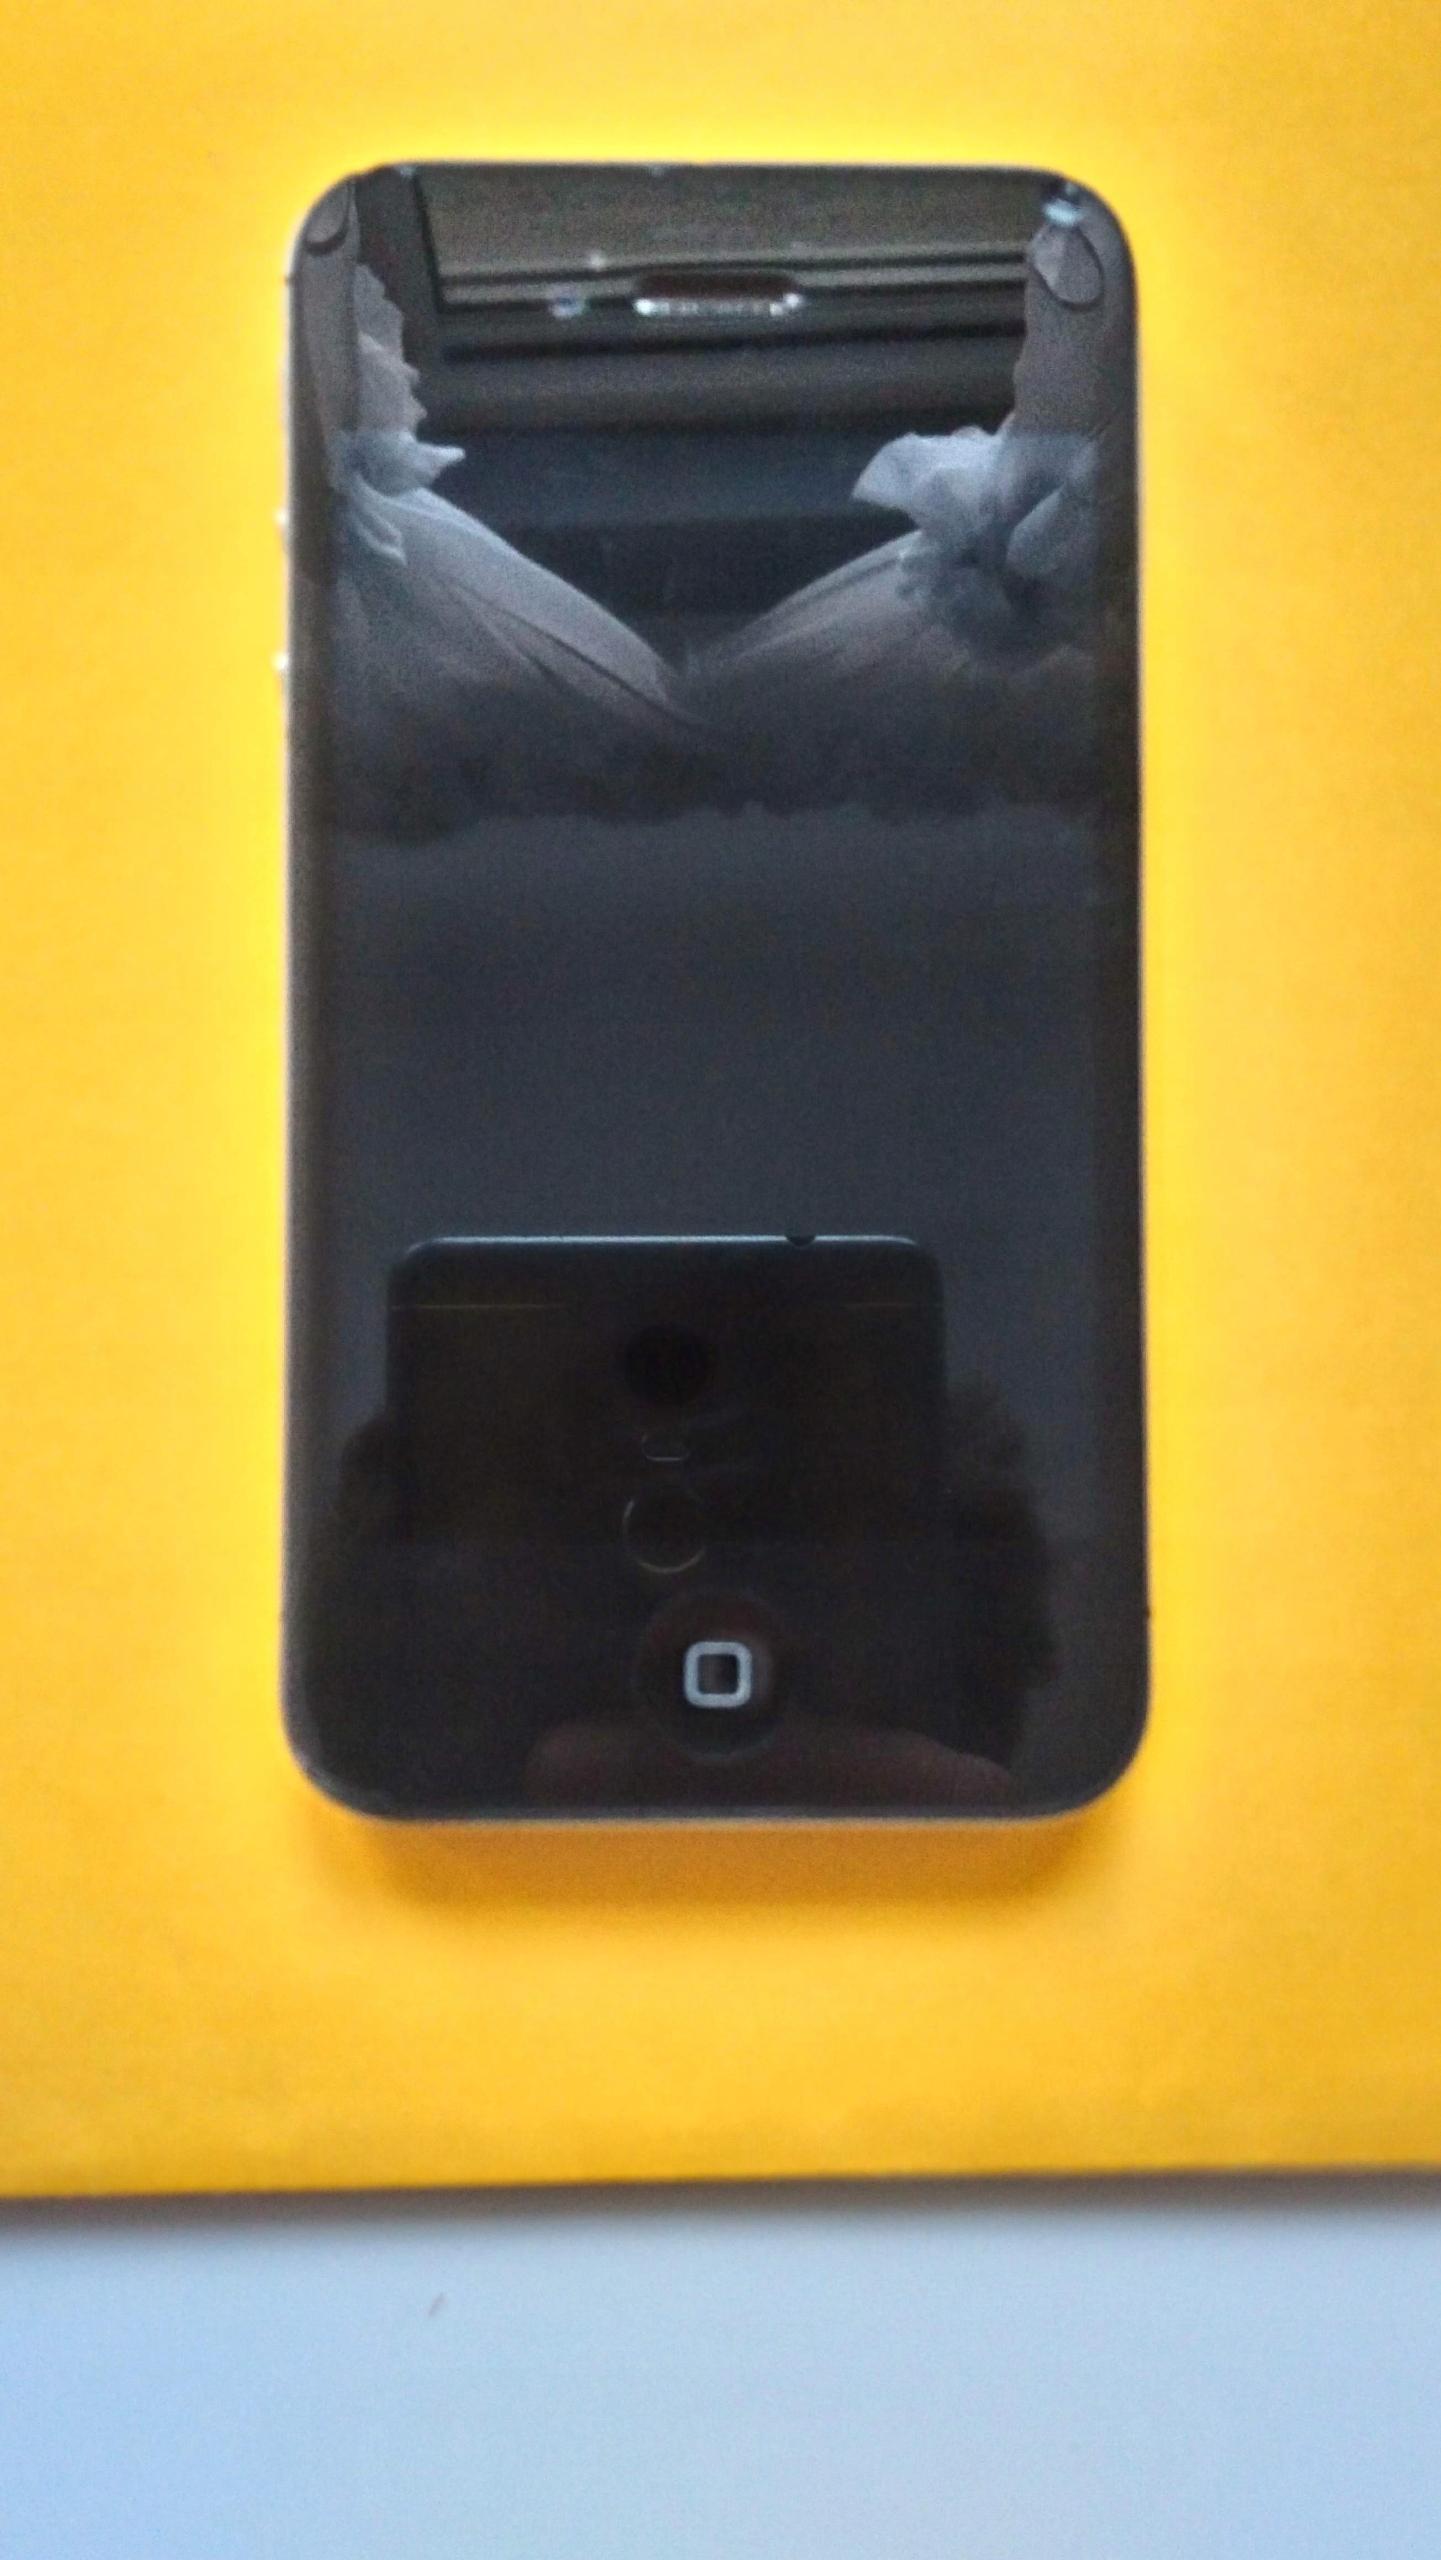 iPhone 4S - oryginalny ekran